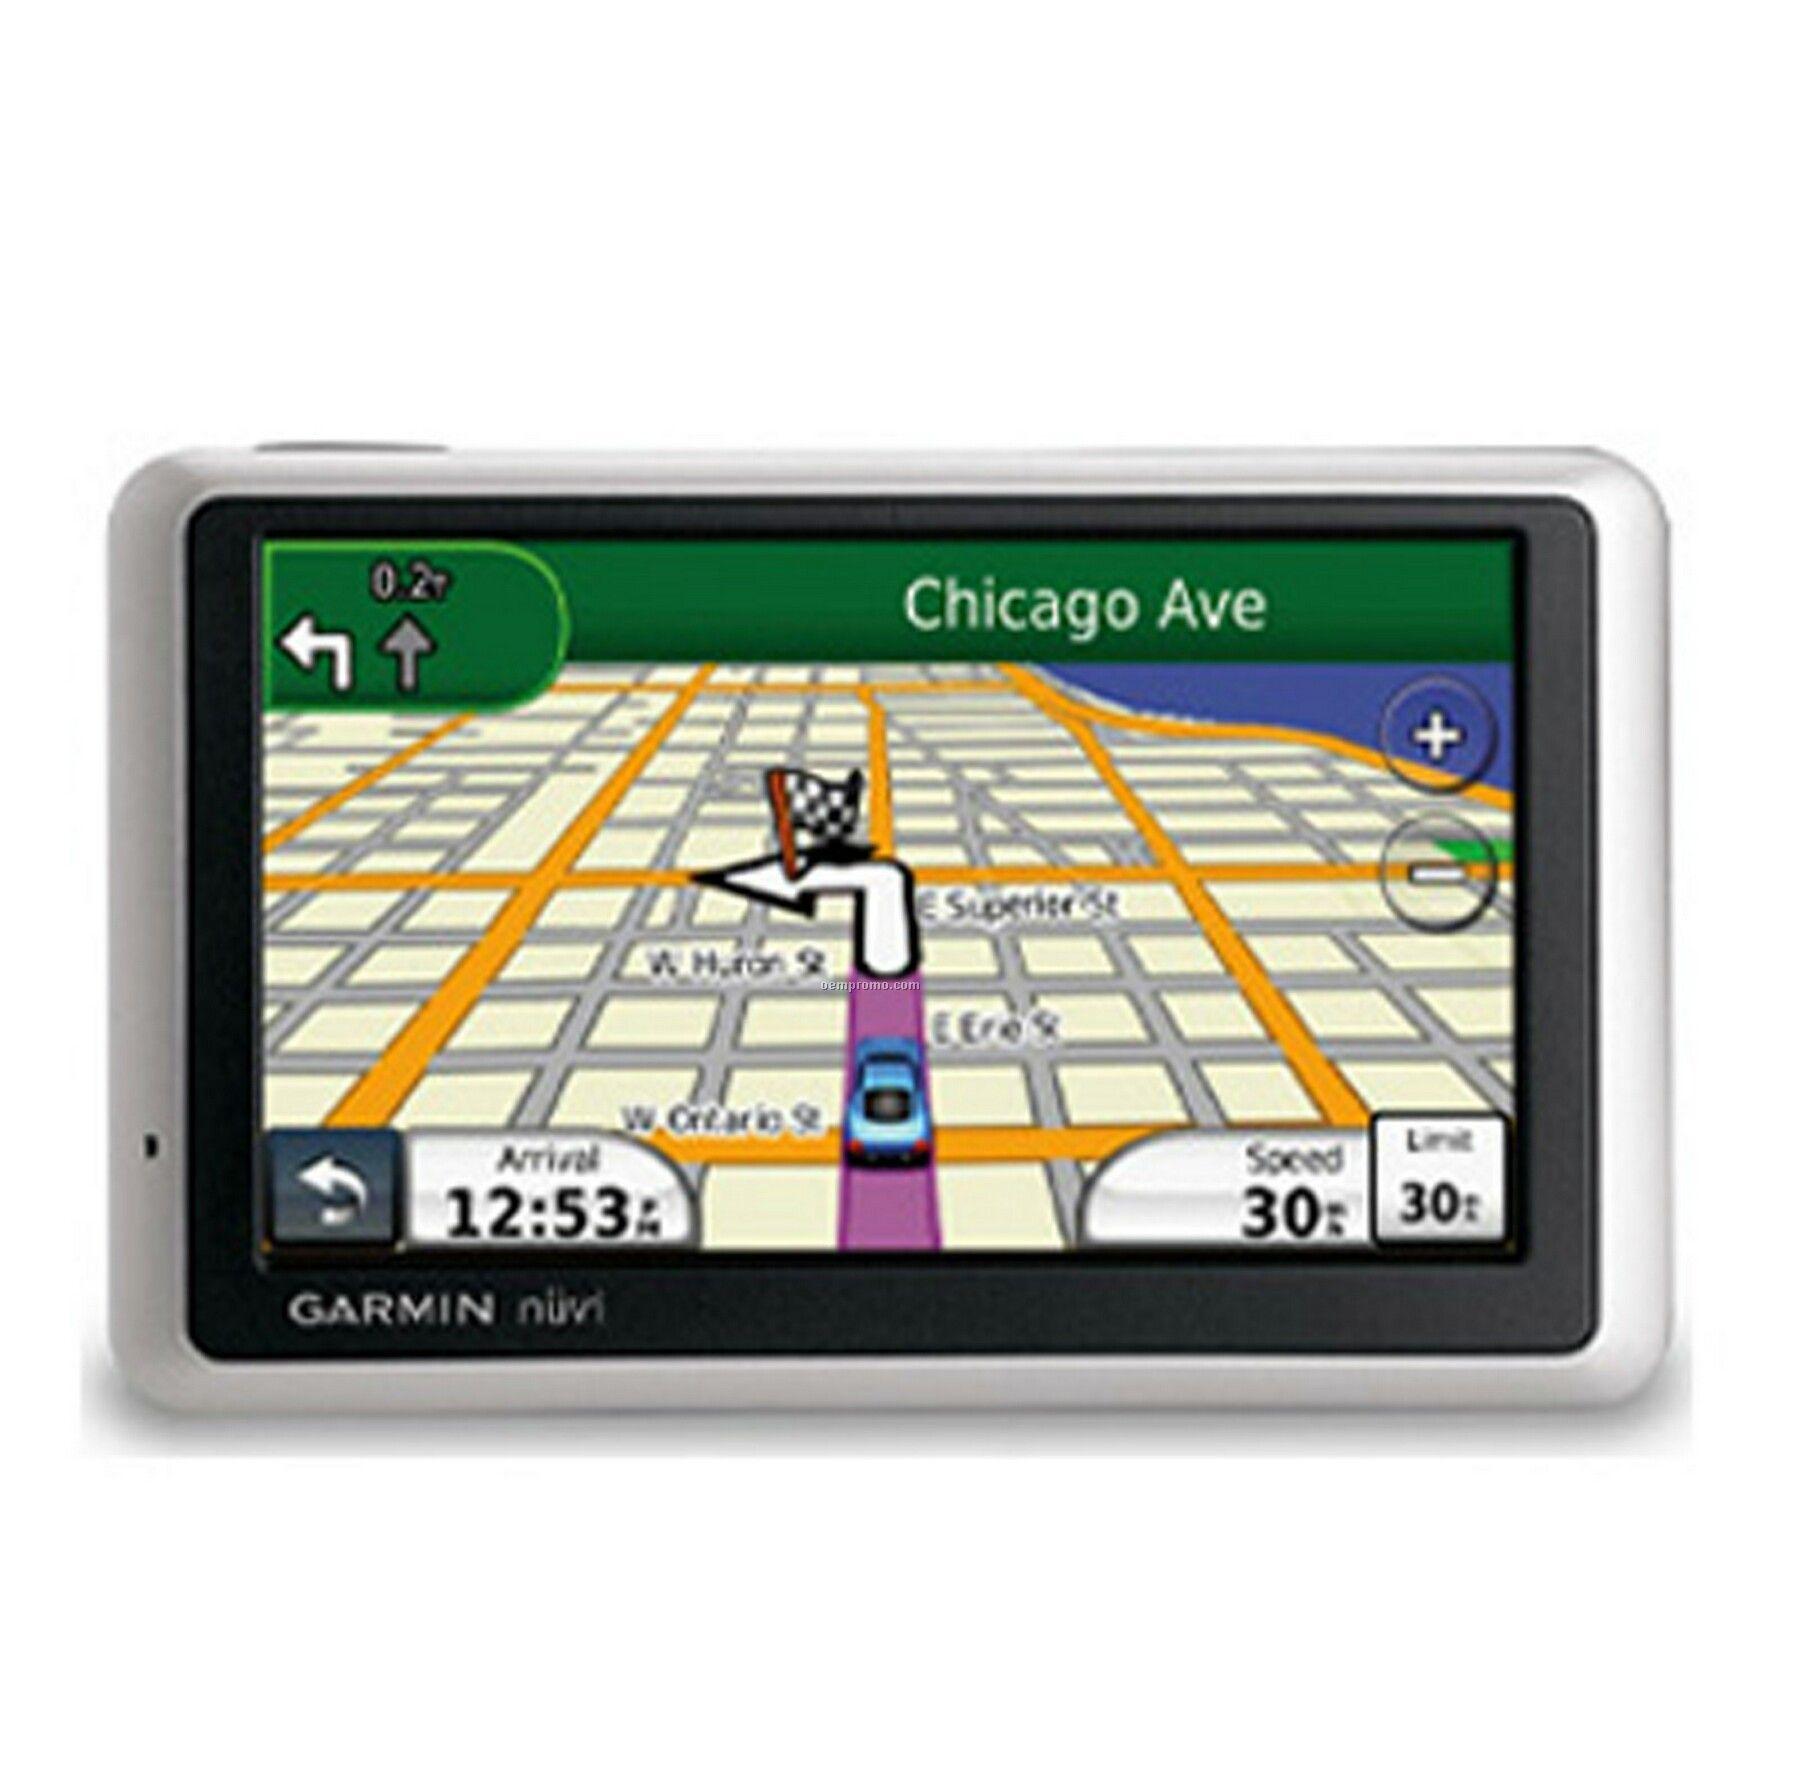 Garmin Navigation Systems For Cars : Garmin nuvi gps vehicle navigation system china